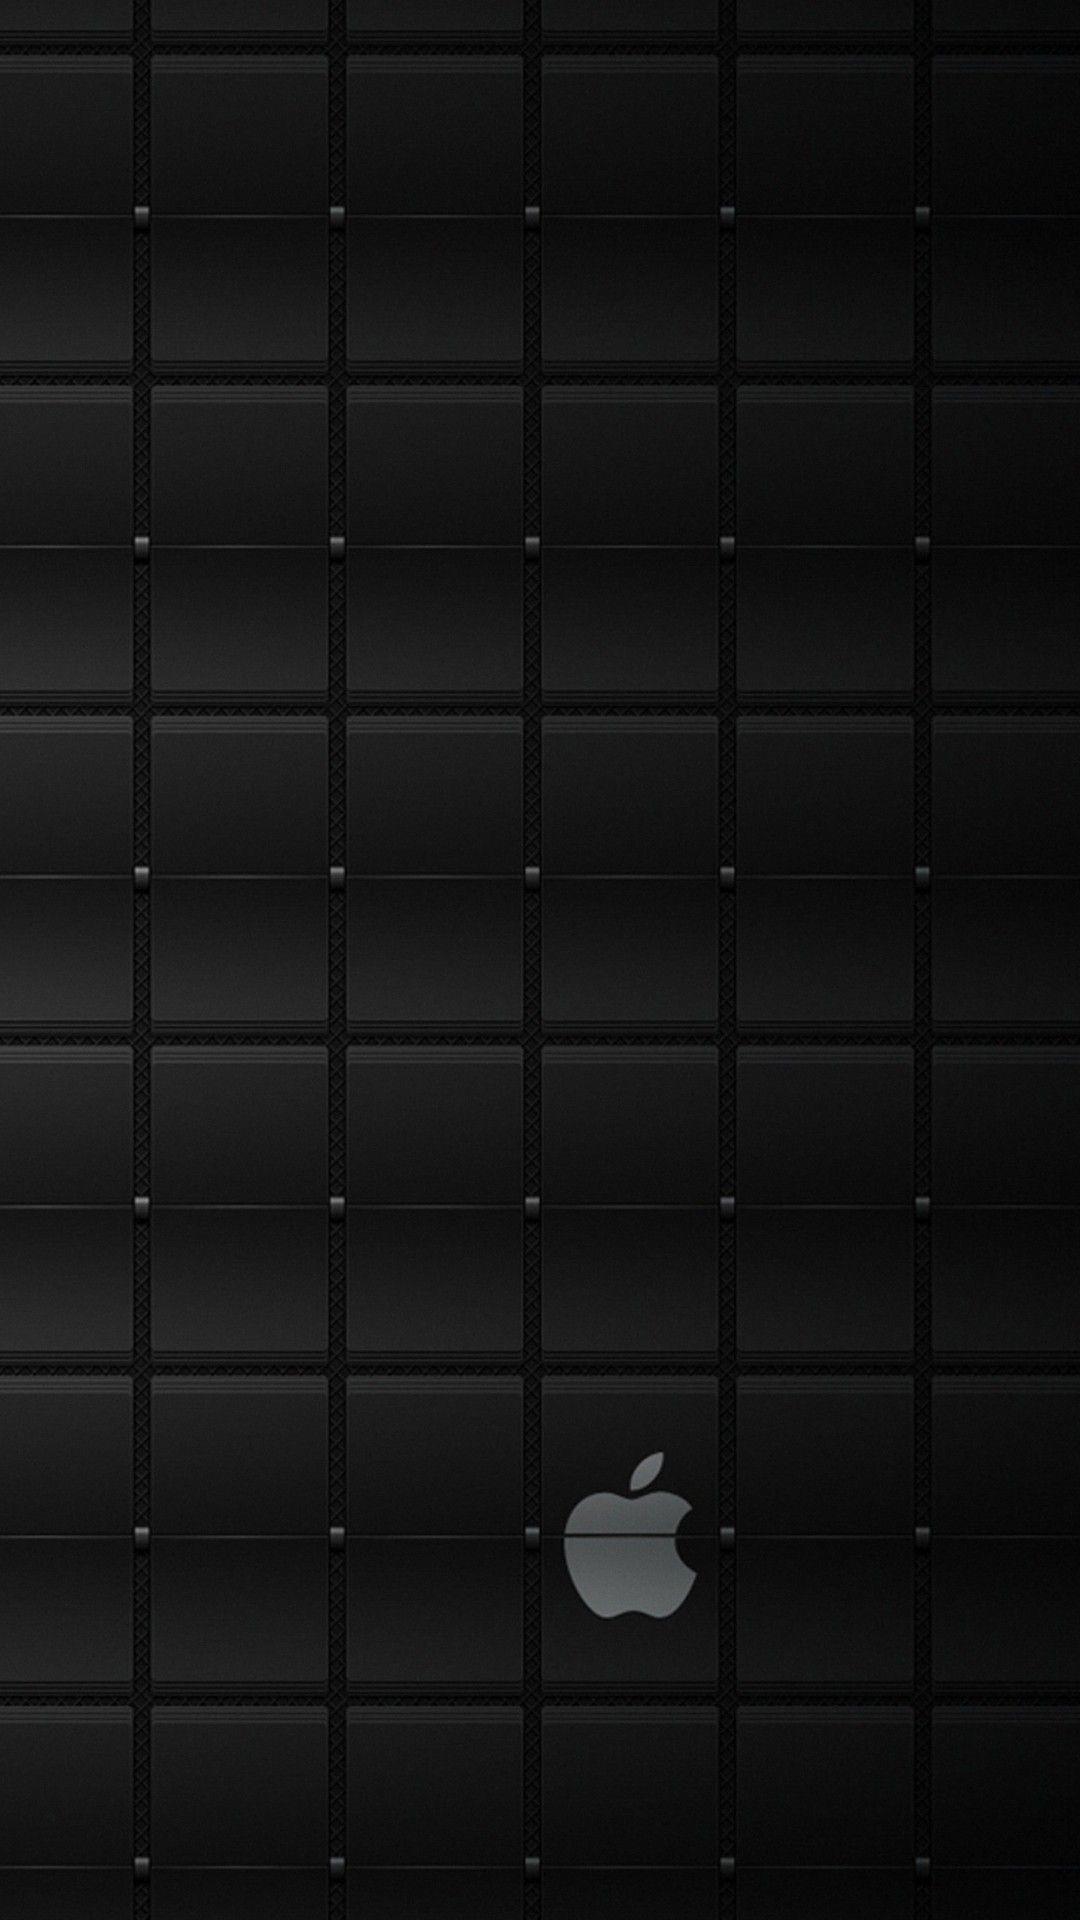 Dark iphone 7 wallpaper